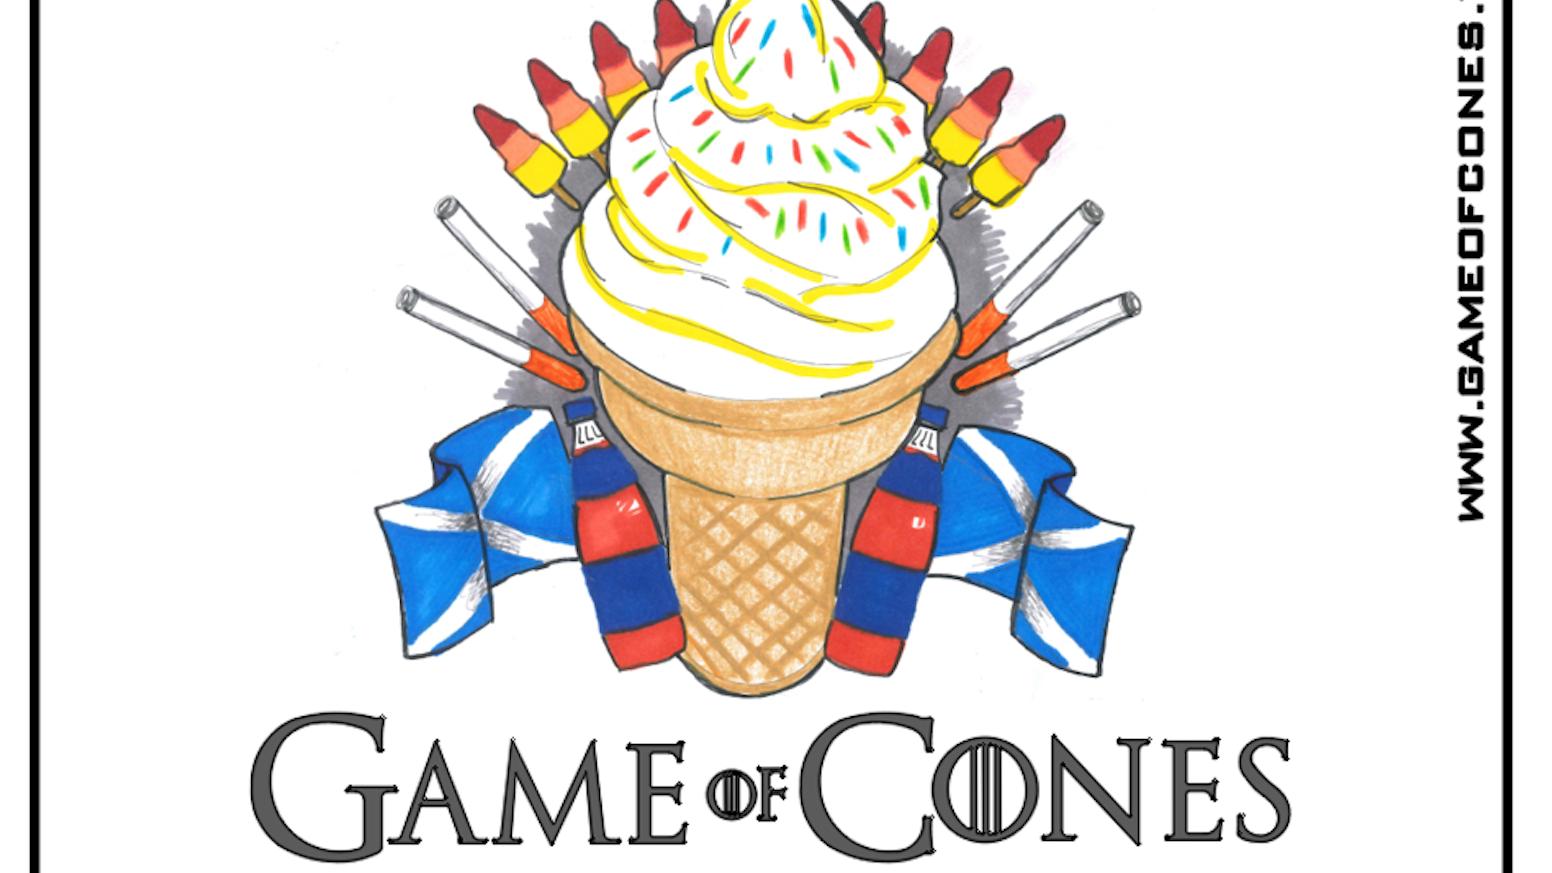 Game Of Cones Comedy Pilot By Lee Crompton Kickstarter